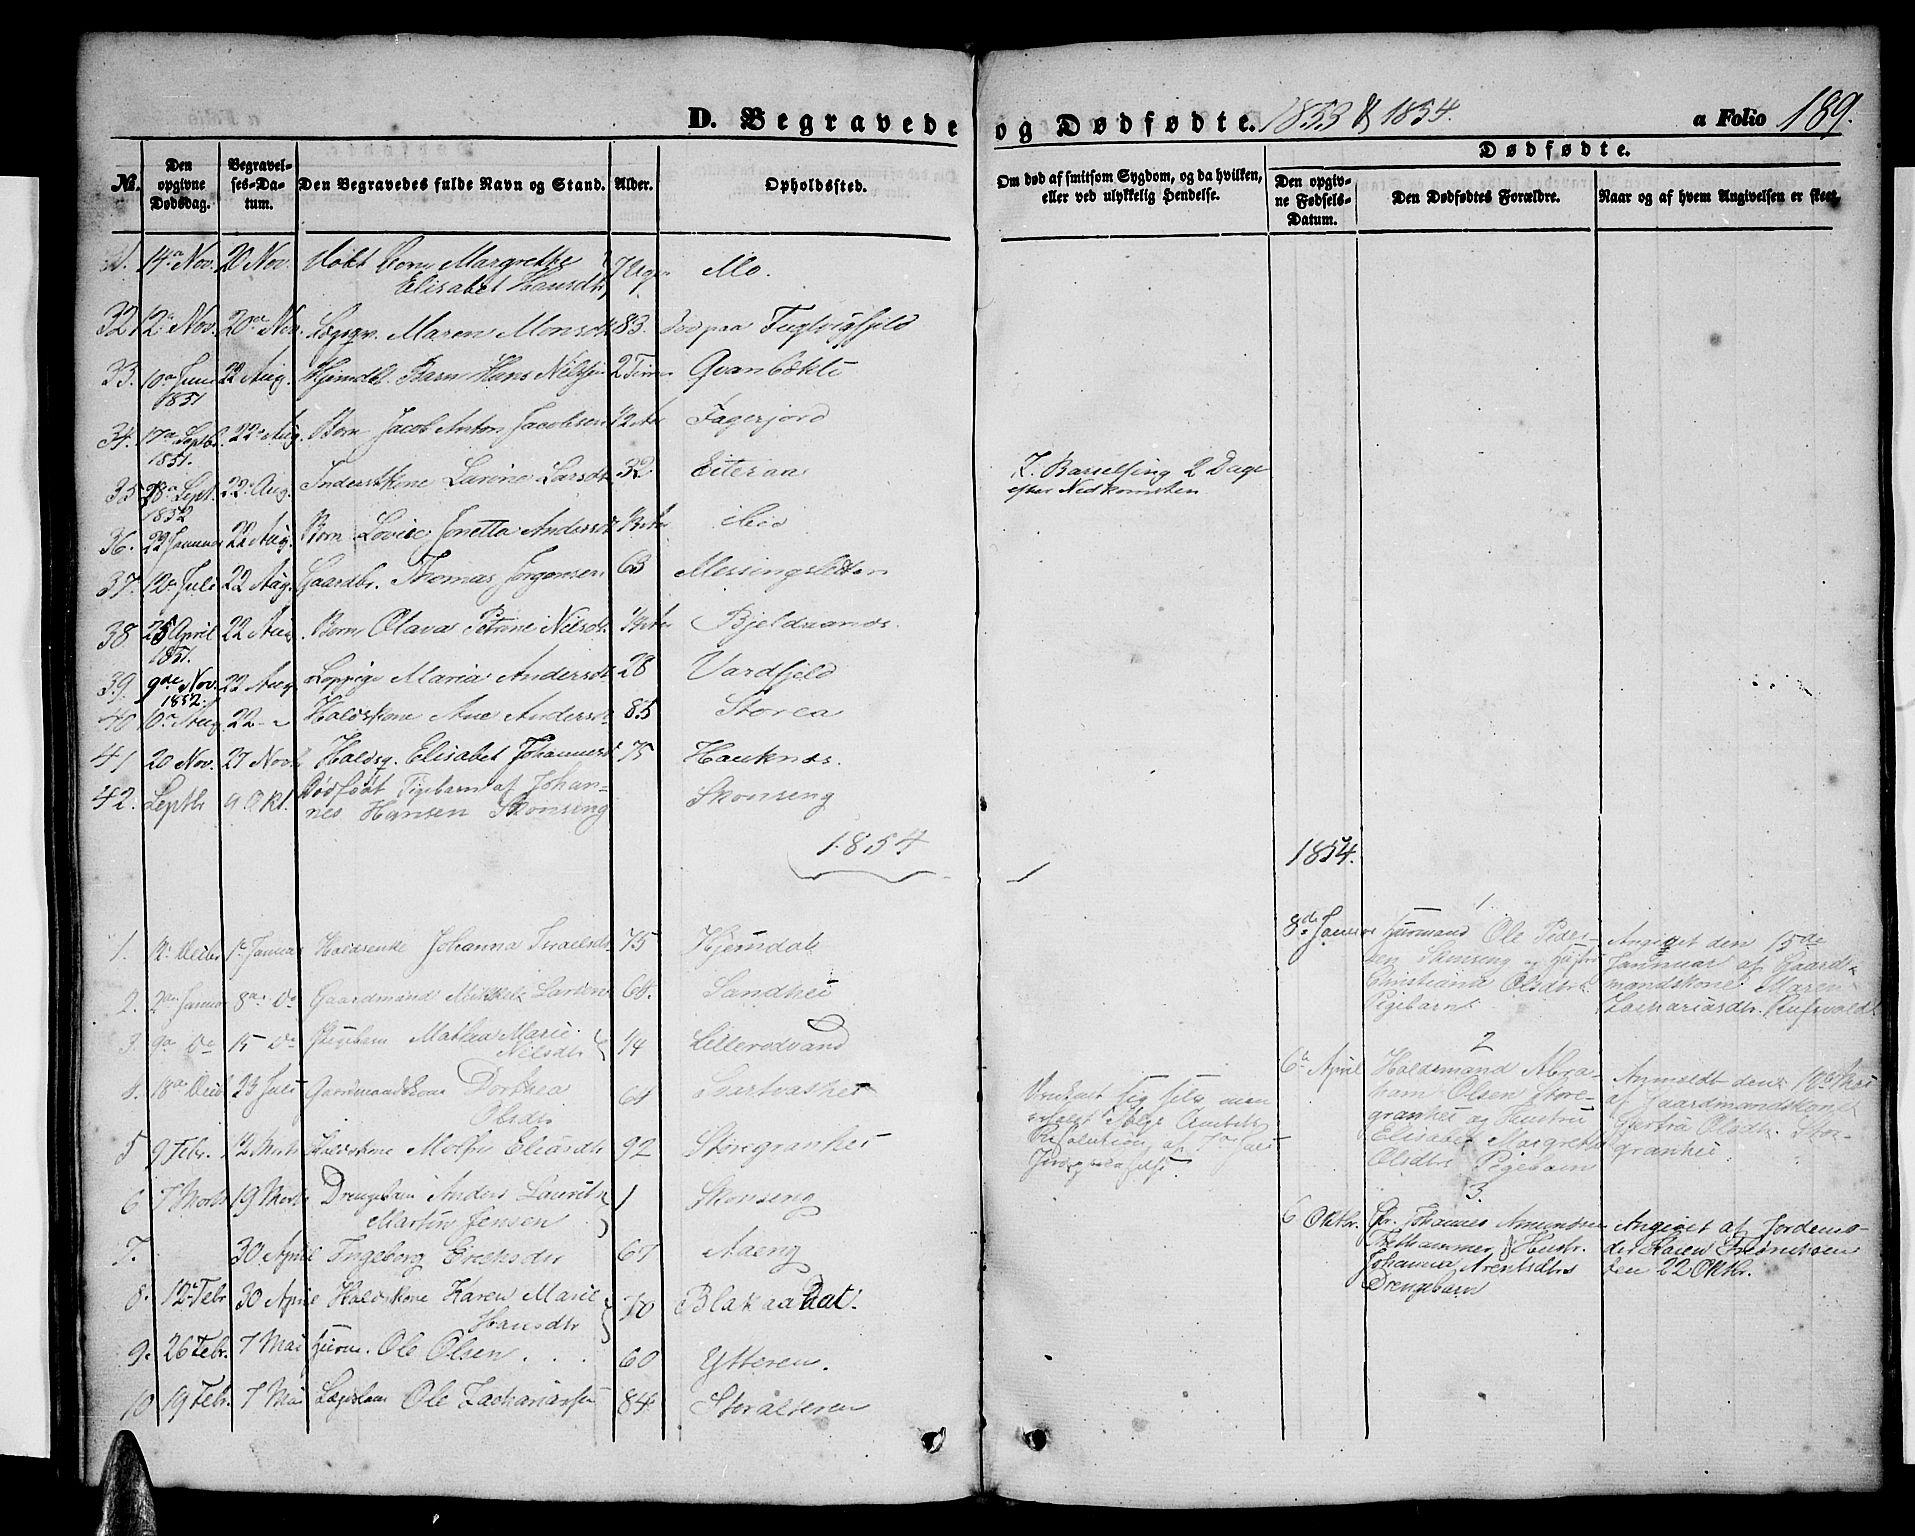 SAT, Ministerialprotokoller, klokkerbøker og fødselsregistre - Nordland, 827/L0414: Klokkerbok nr. 827C03, 1853-1865, s. 189